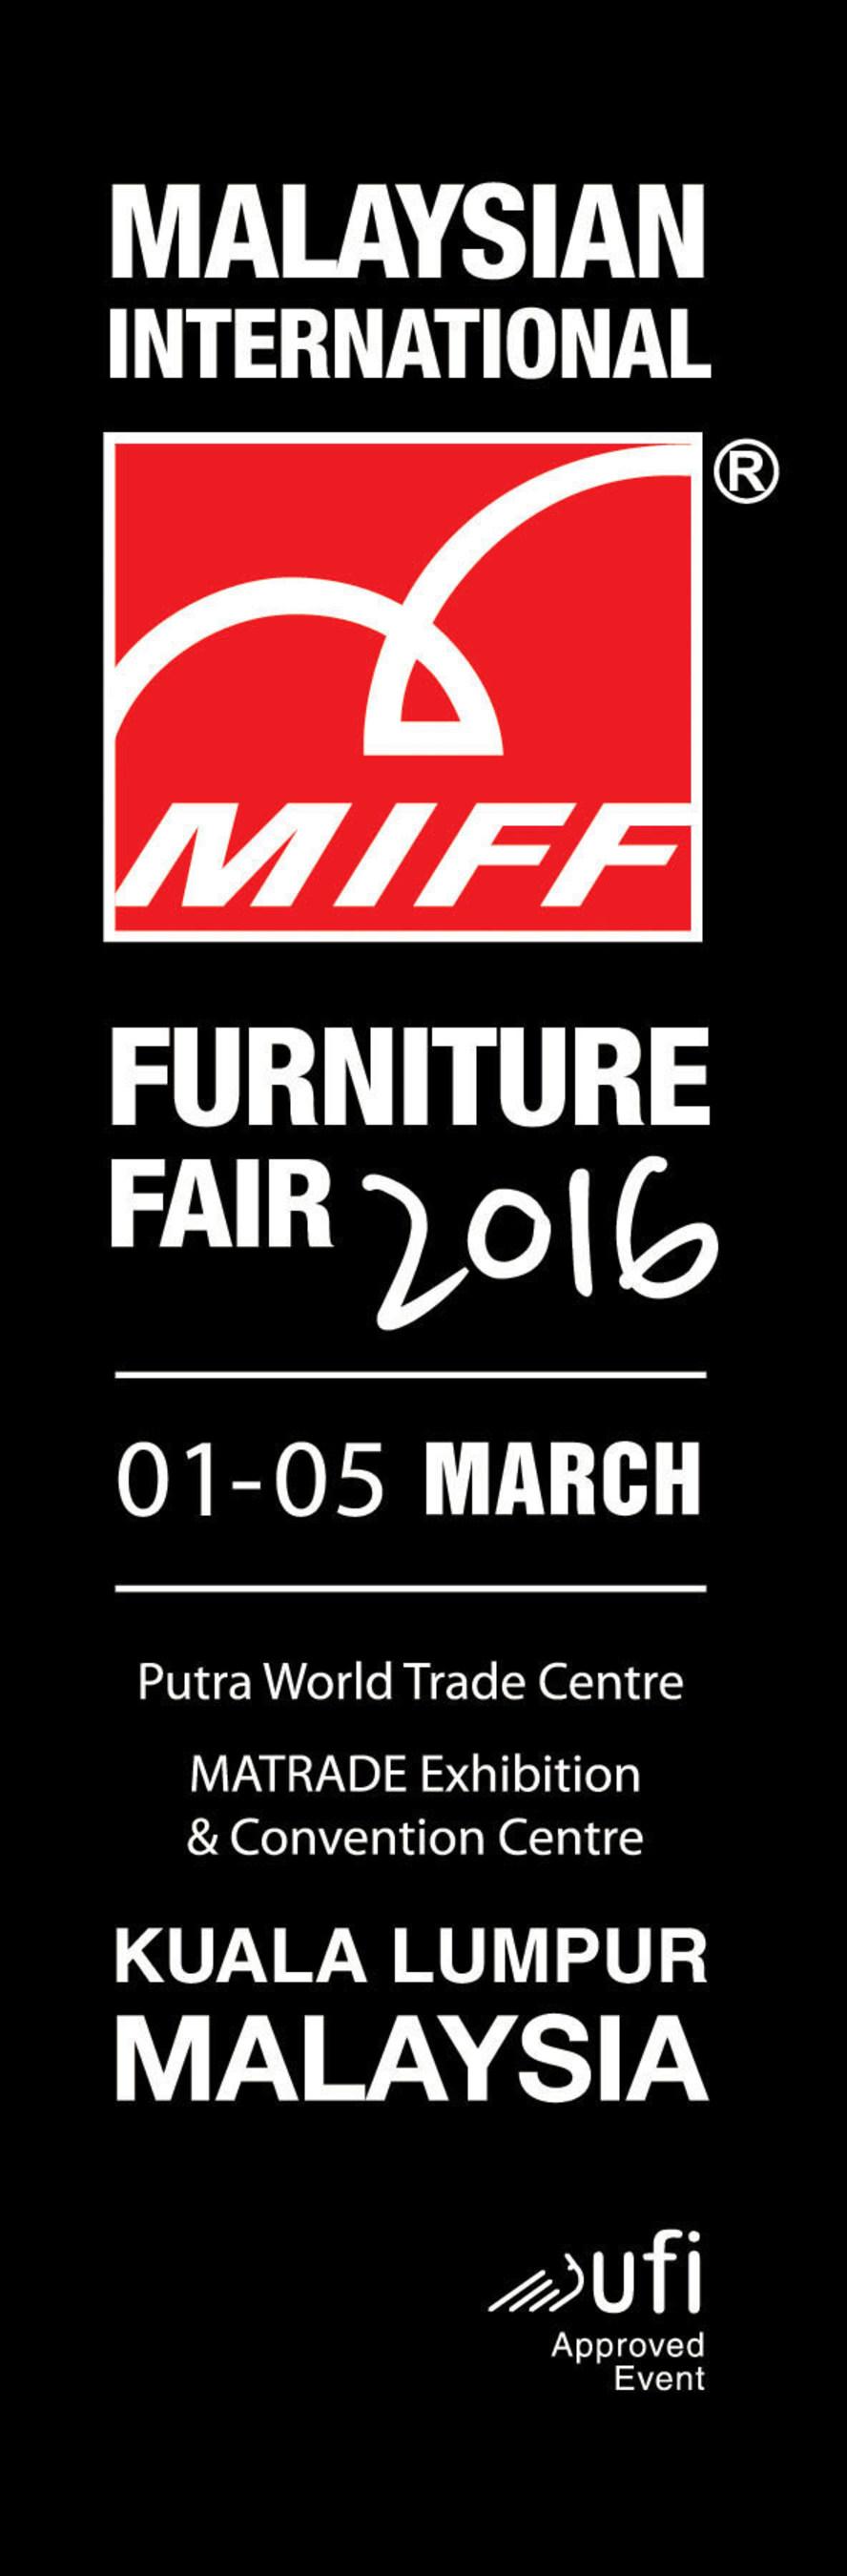 Malaysian International Furniture Fair 2016 Opens With